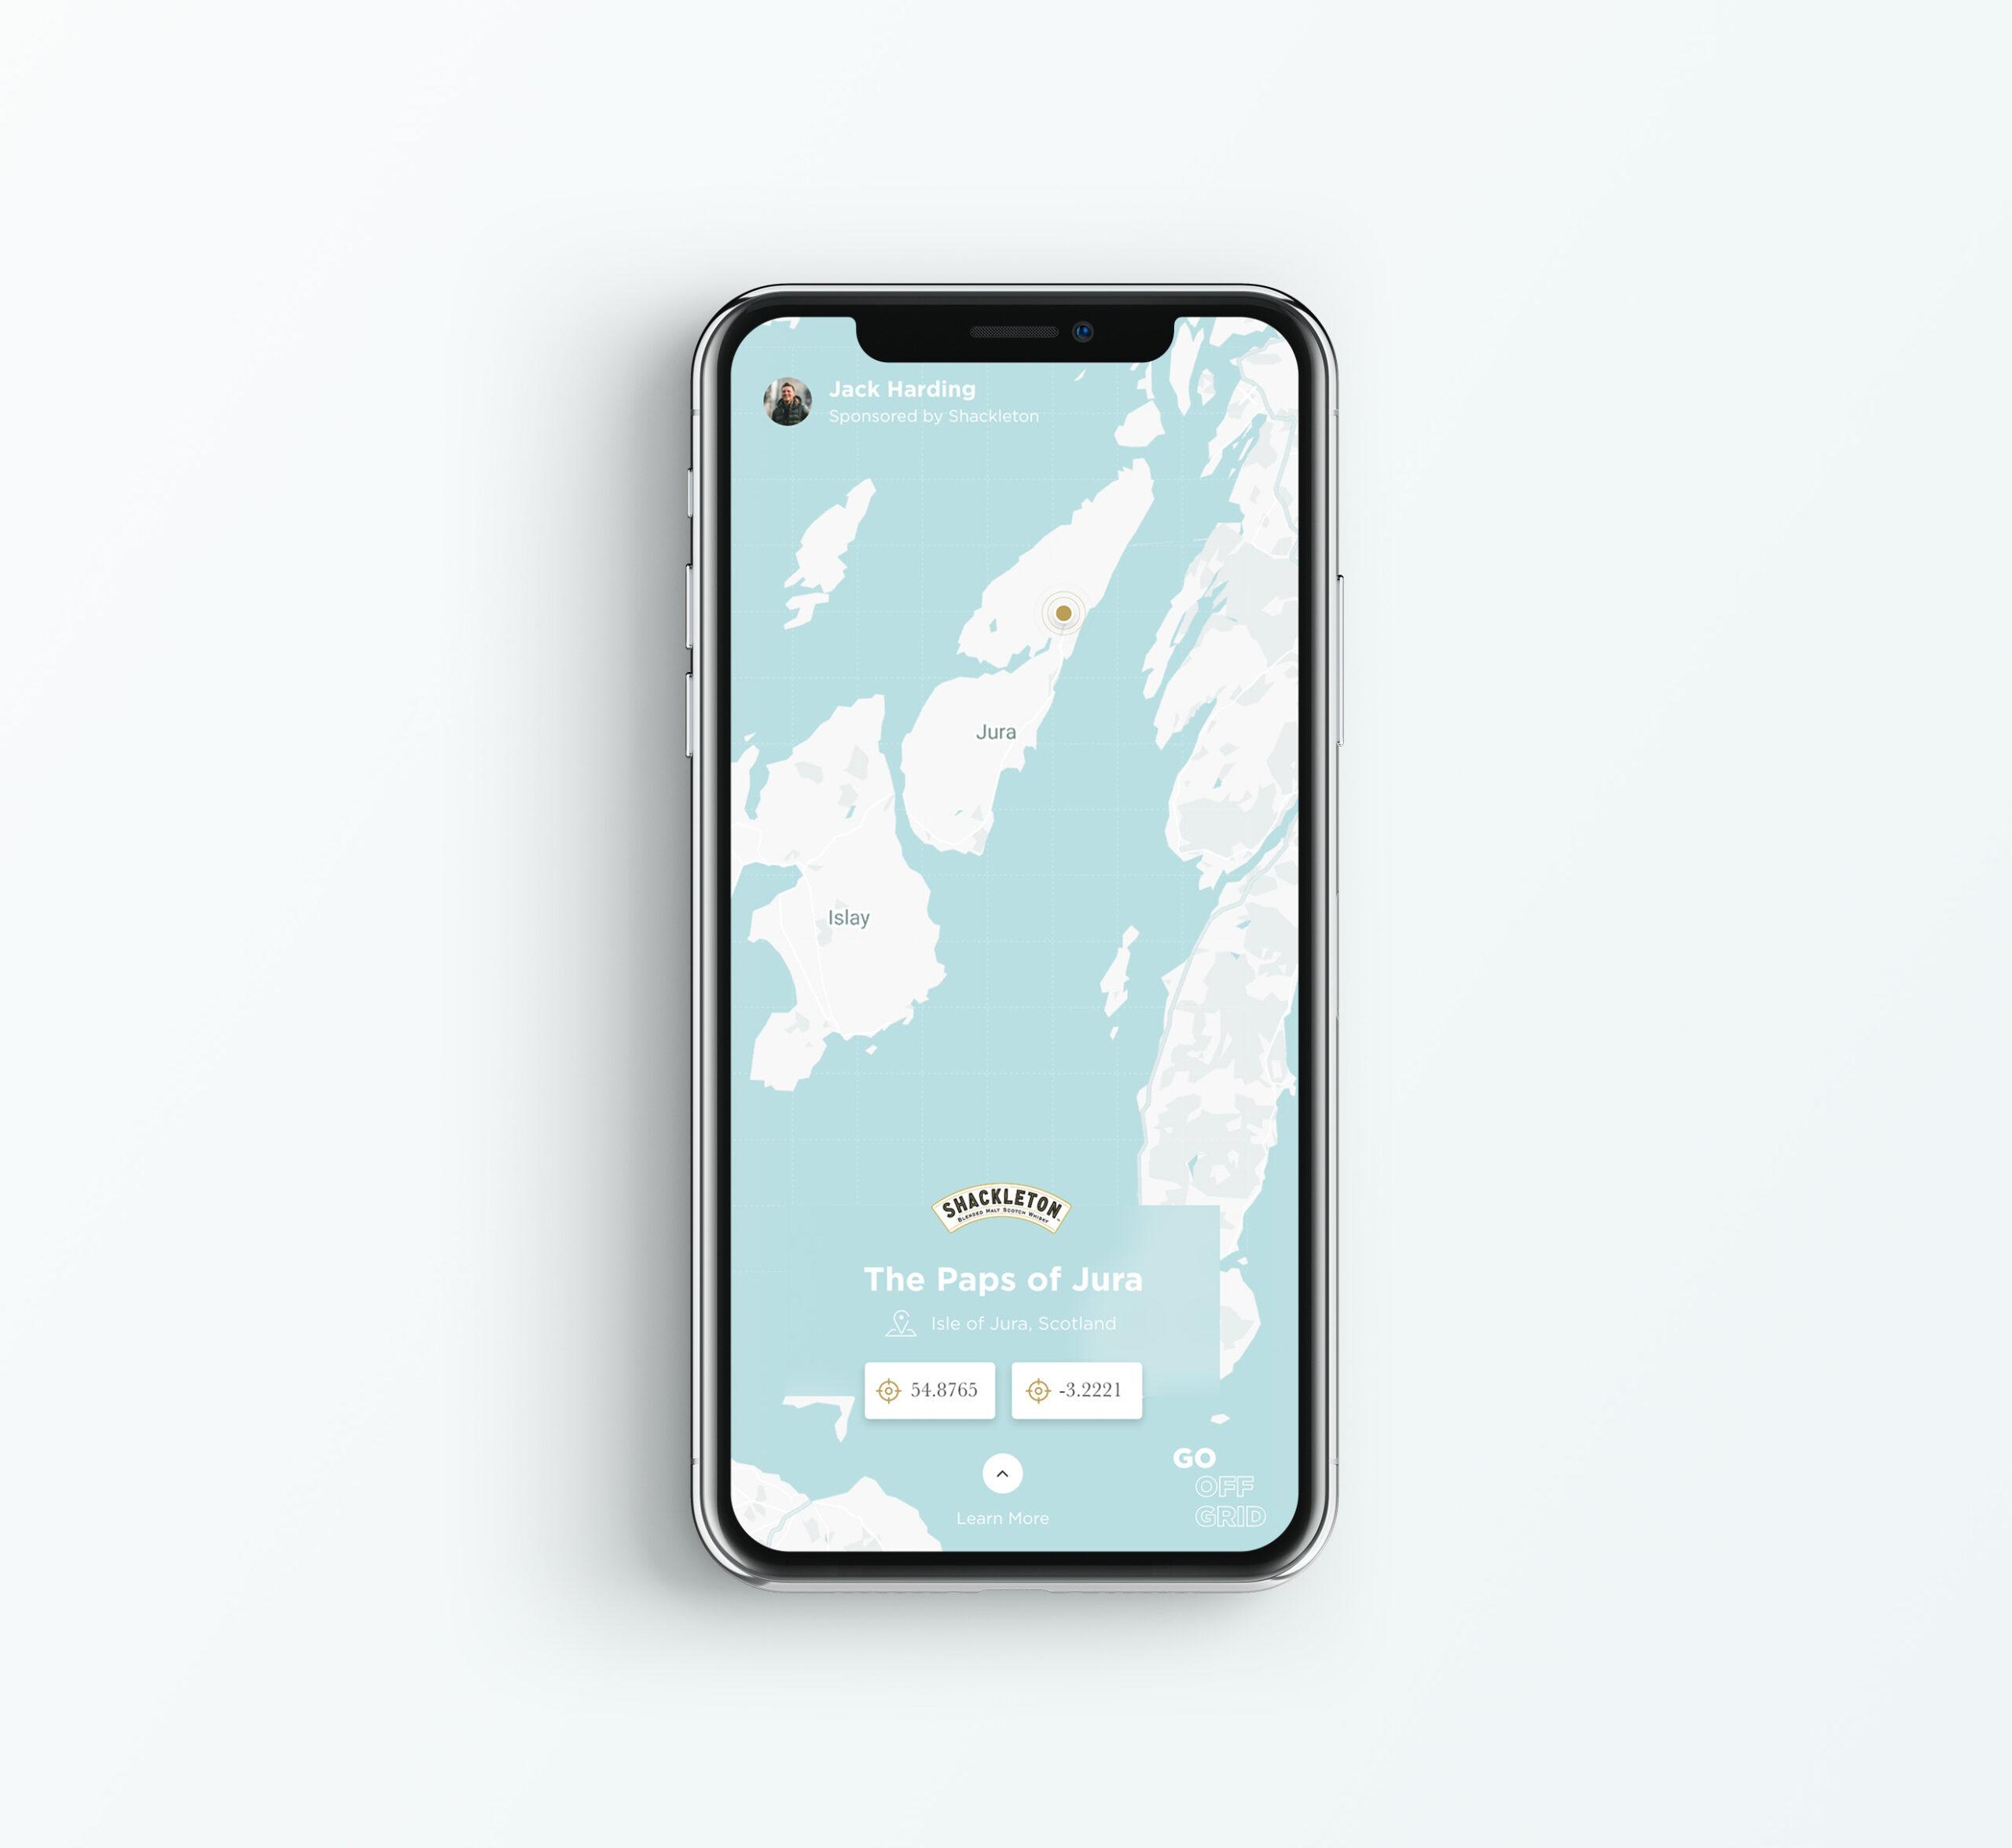 GOG Share Map